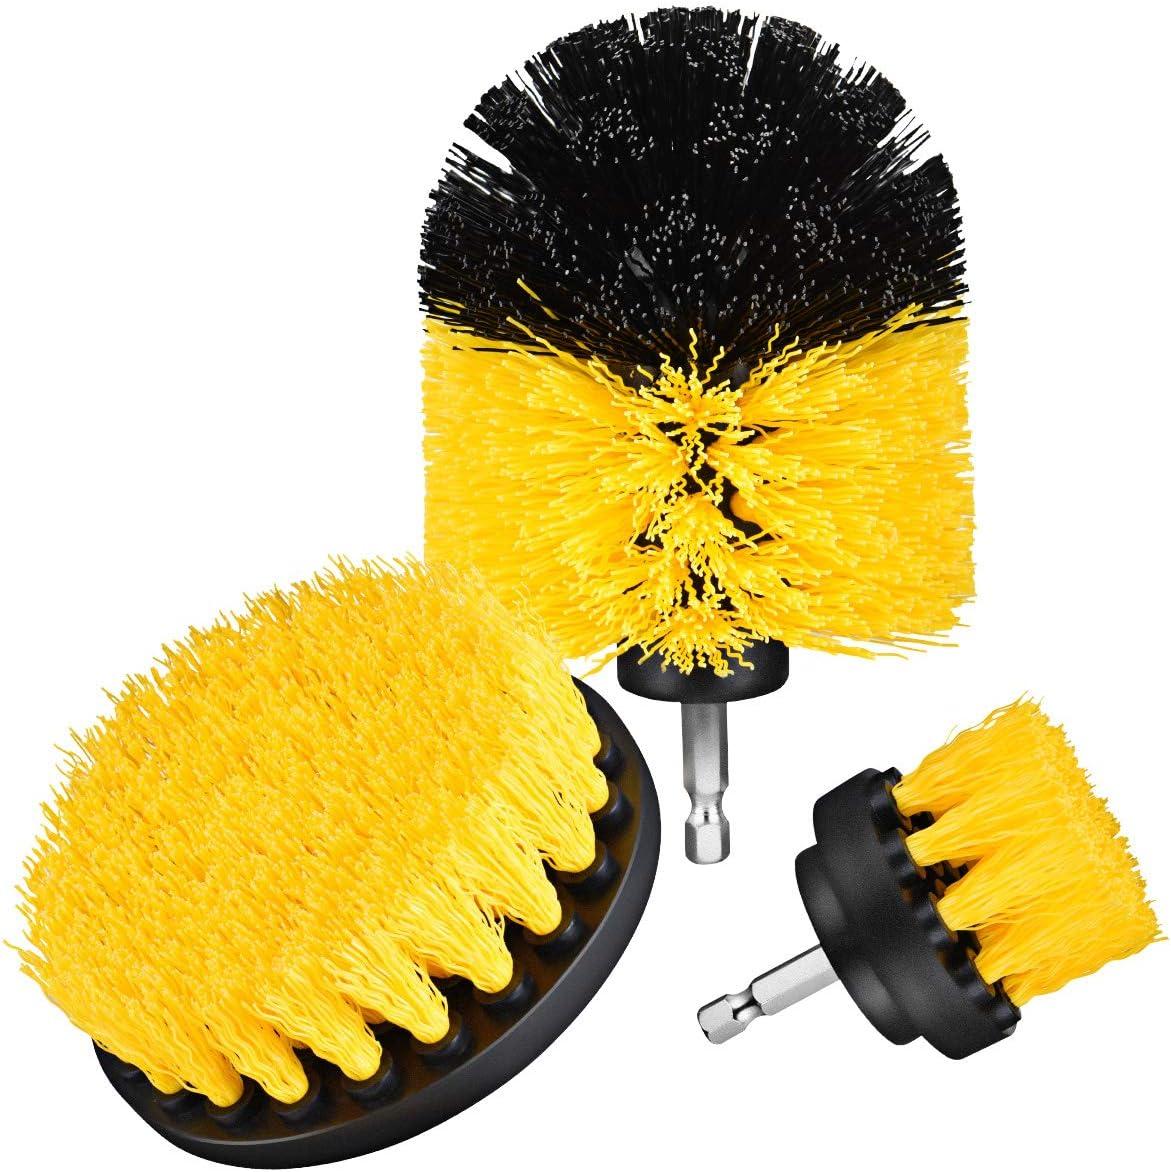 3 Pcs Nylon Drill Powered Cleaning Brushes Kit for Bathroom Surface Tub All Purpose Power Scrubber Cleaning Brush Kit Tire Toilet,Bathtub Kitchen,Tile Holife Drillbrush